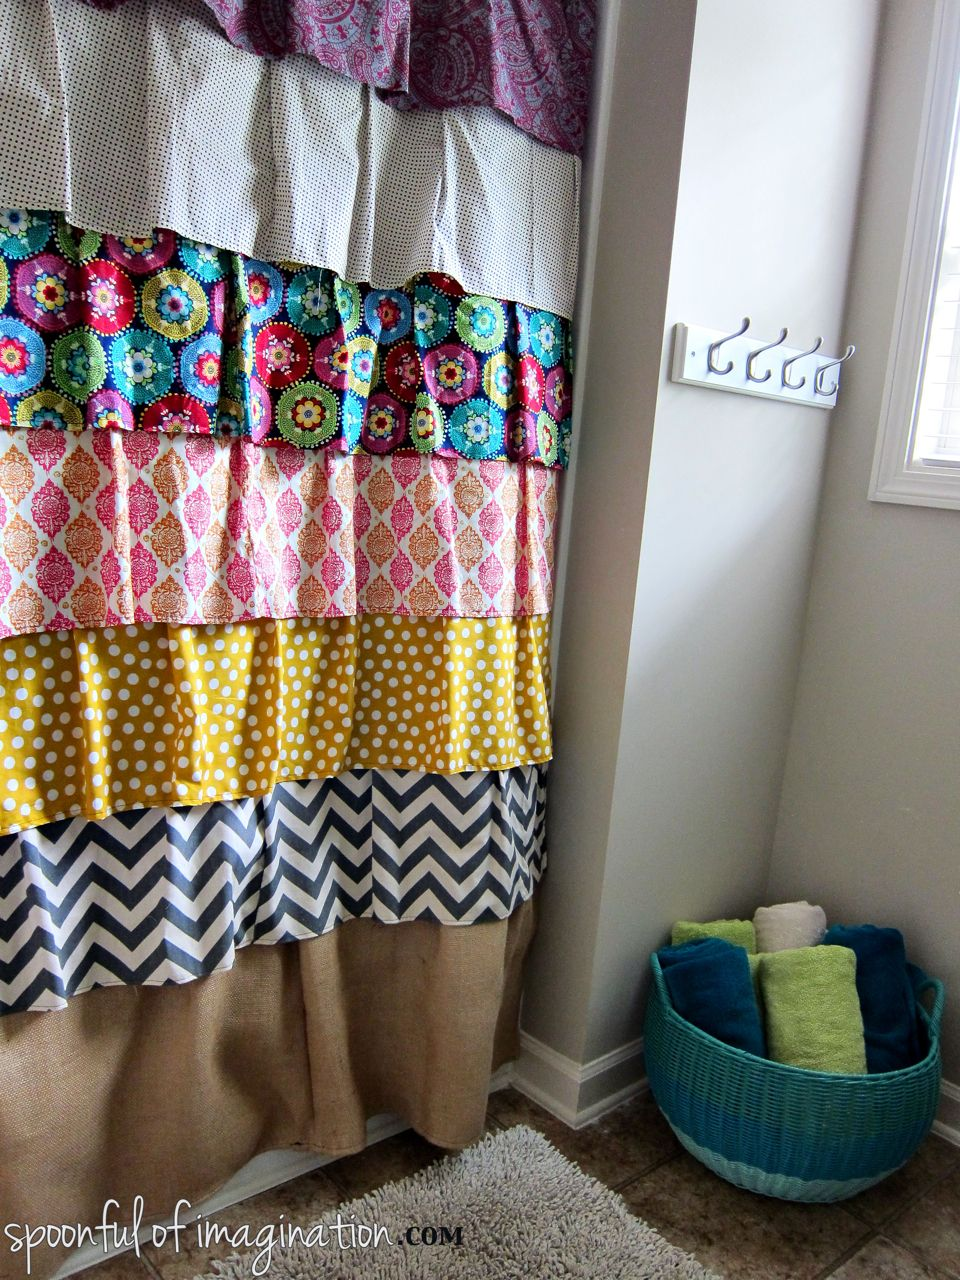 Diy ruffled shower curtain - Diy Ruffled Shower Curtain Spoonful Of Imagination